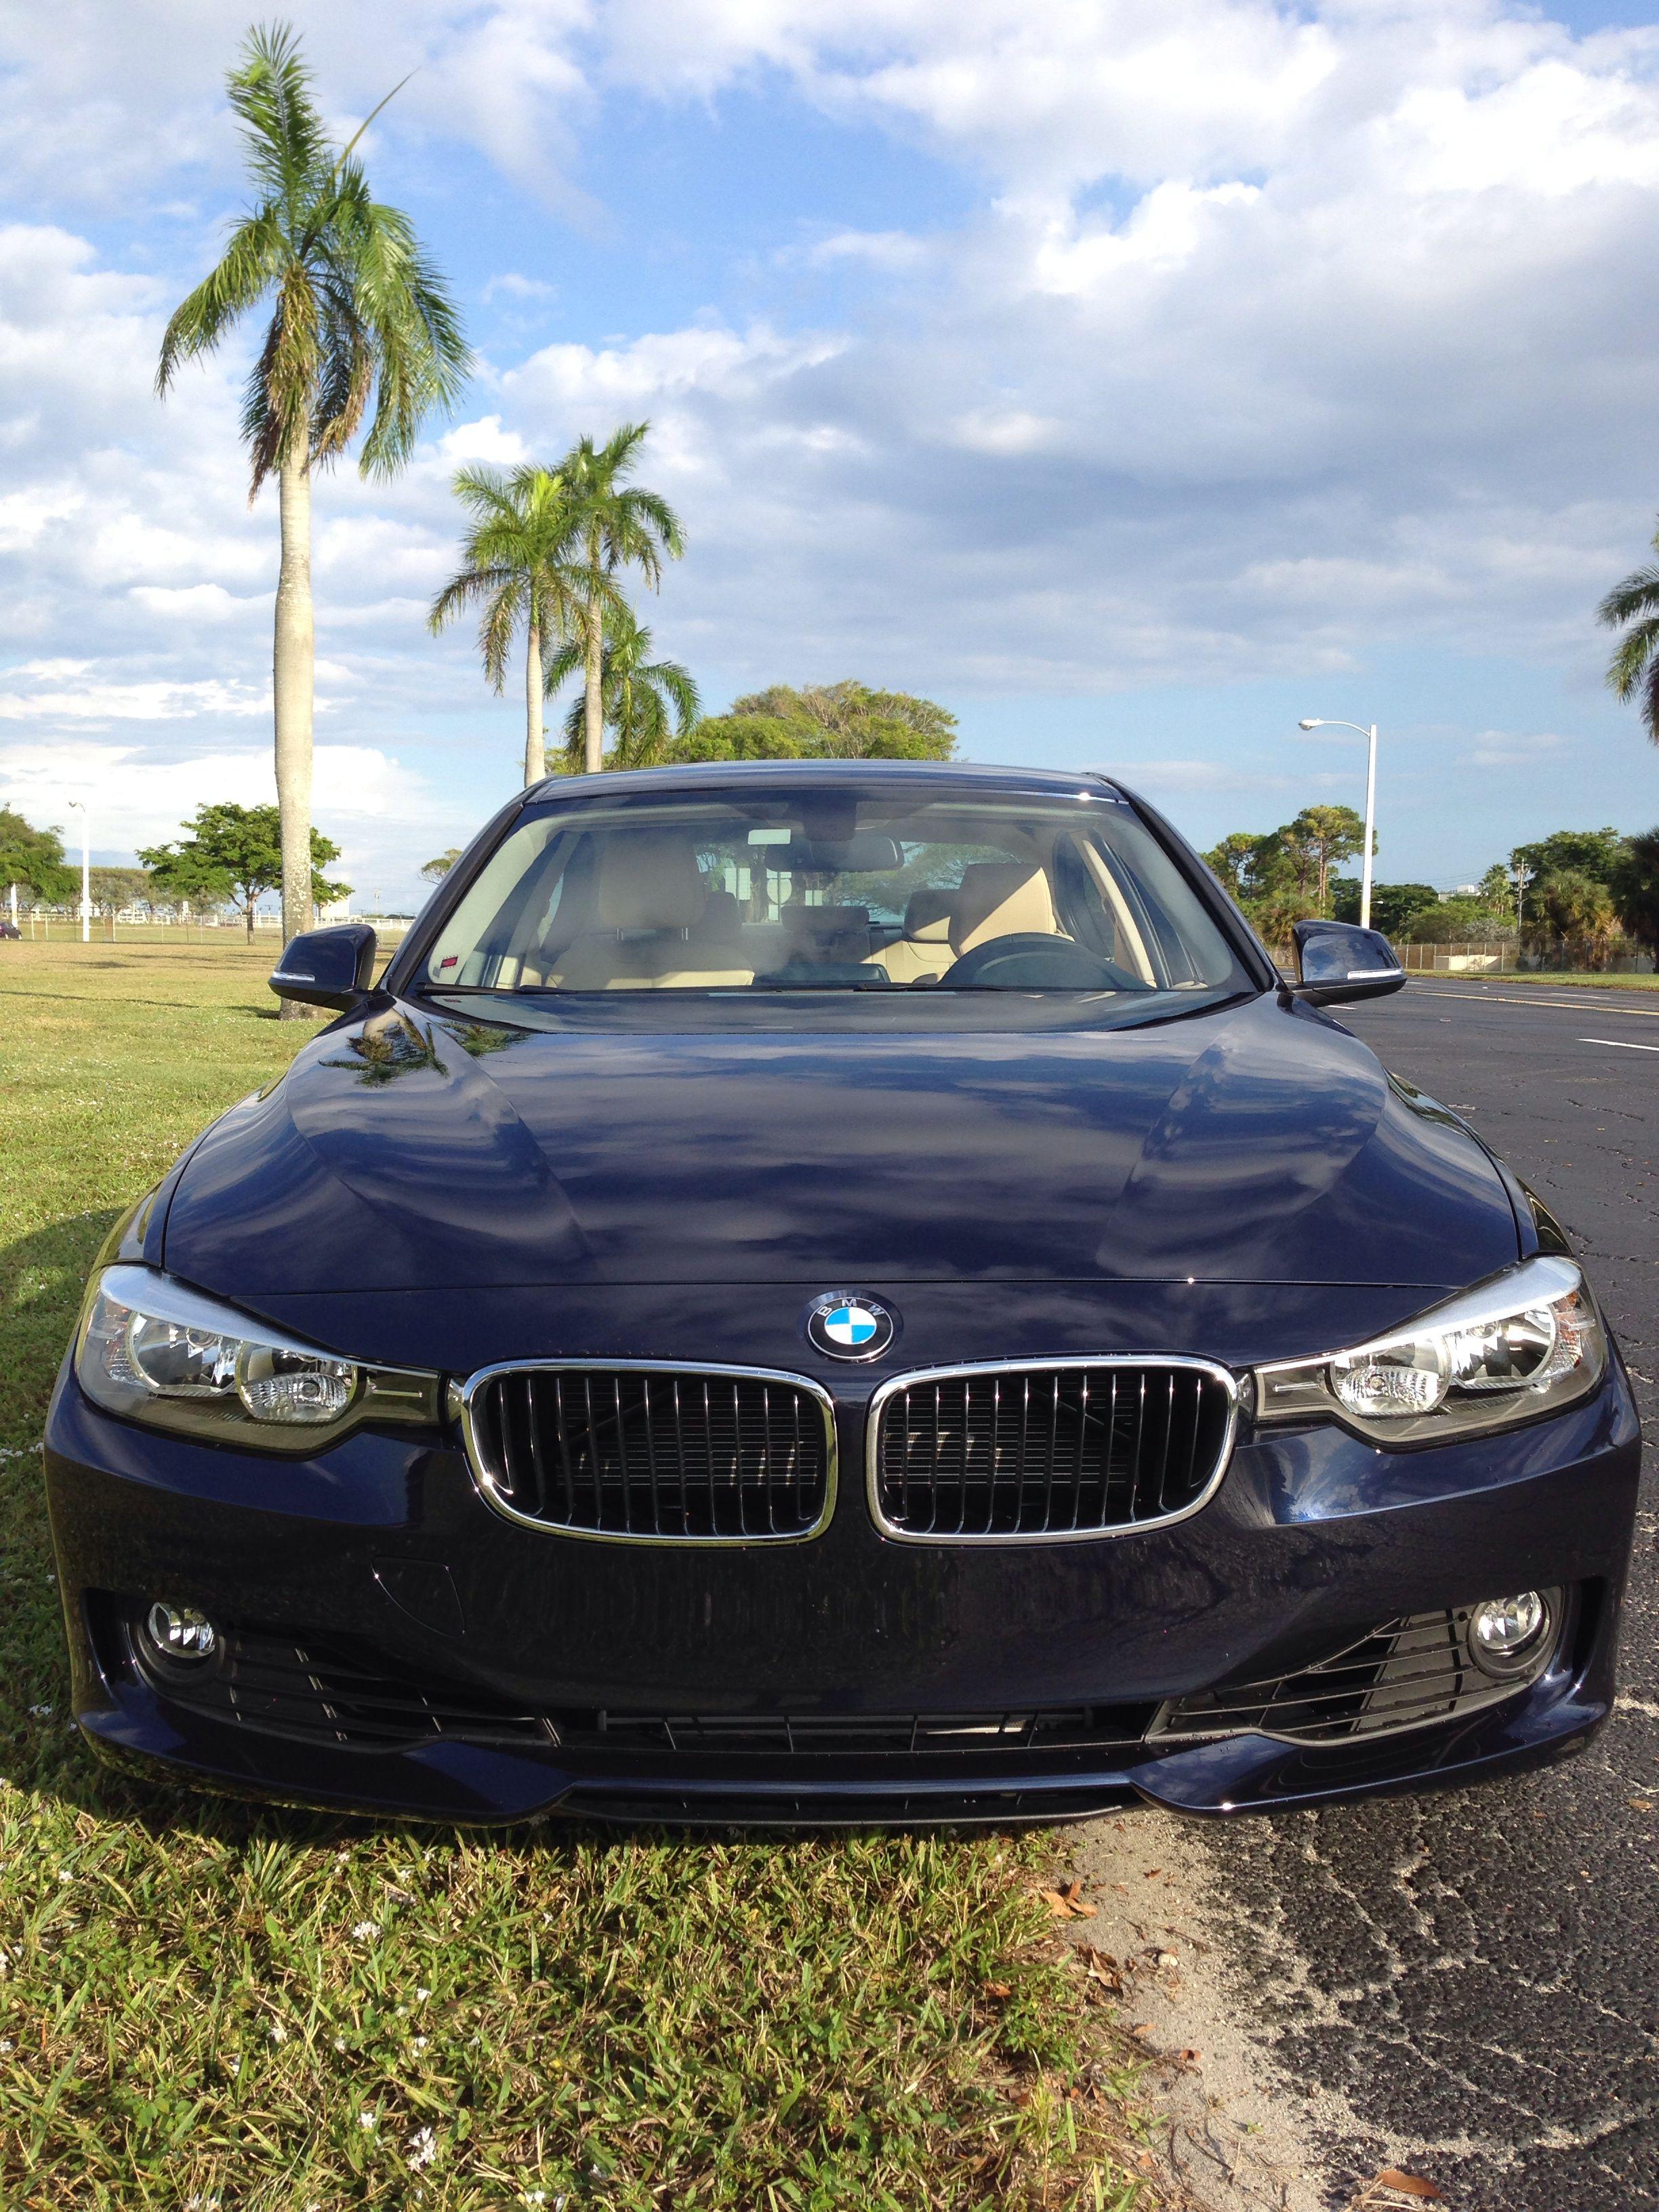 2014 BMW 328 I Goals and Interests Pinterest